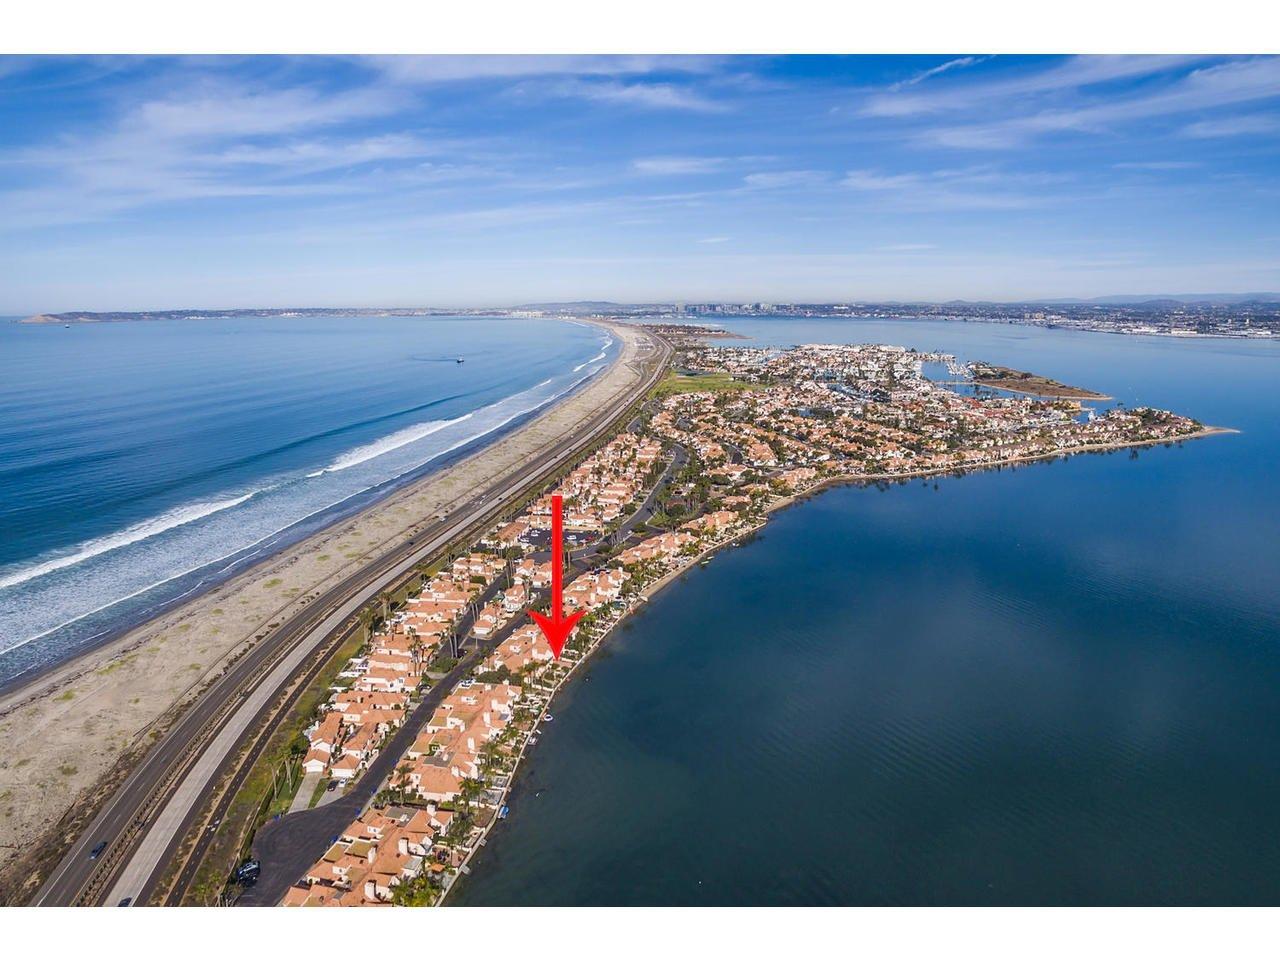 Photo 19: Photos: Townhome for sale : 3 bedrooms : 77 Tunapuna Lane in Coronado